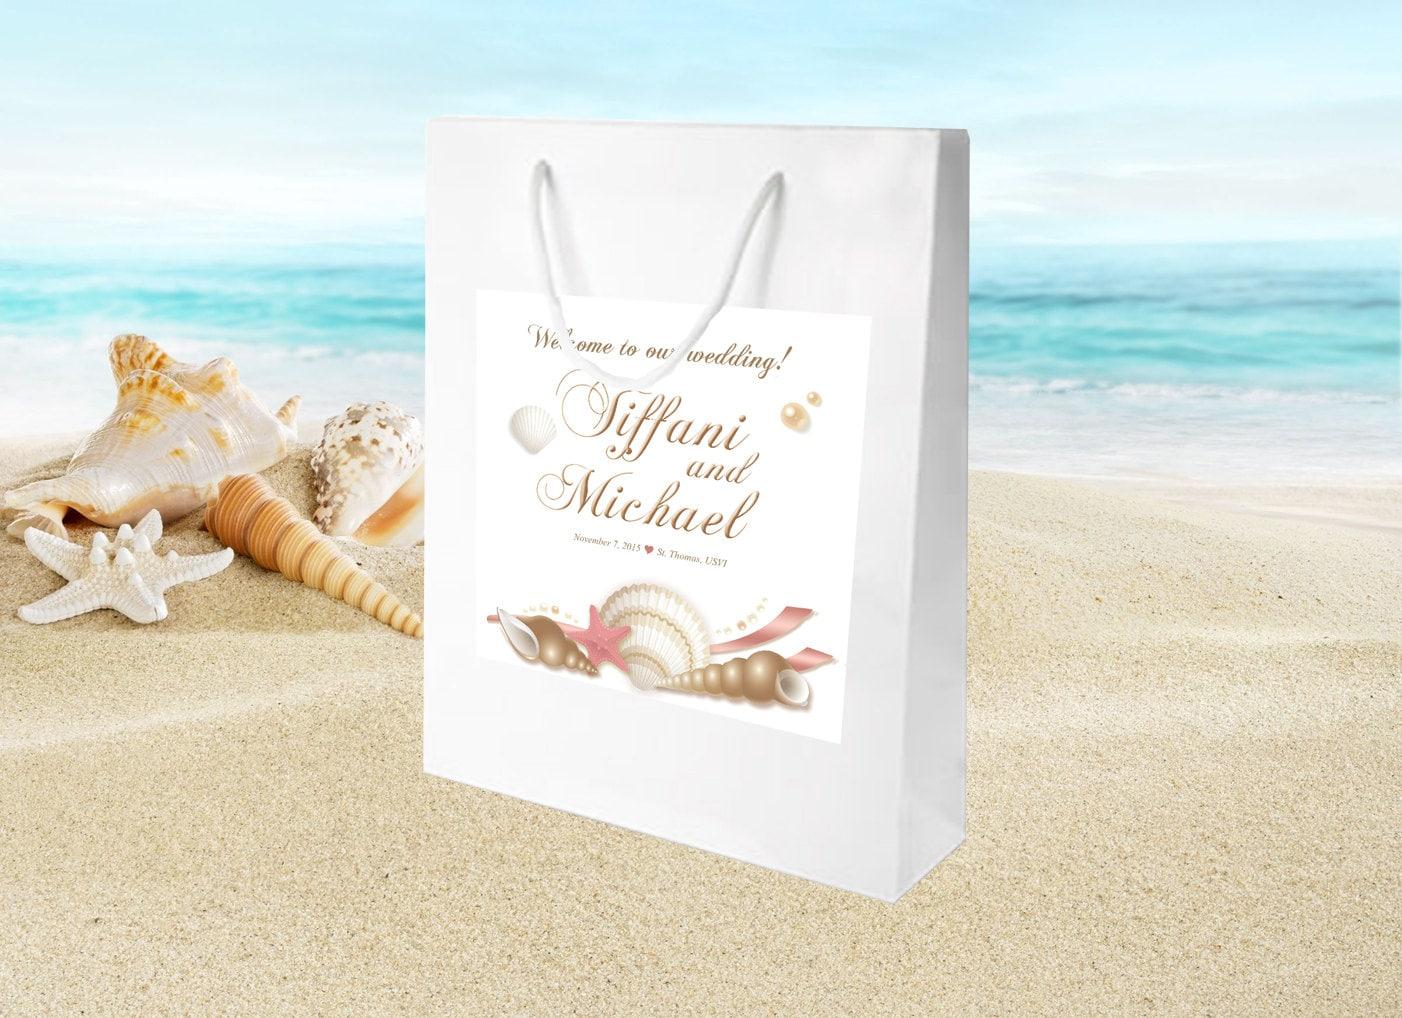 Beach Wedding Gift Bag Ideas: 20 TicTac Labels, Beach Destination Wedding Welcome Bag